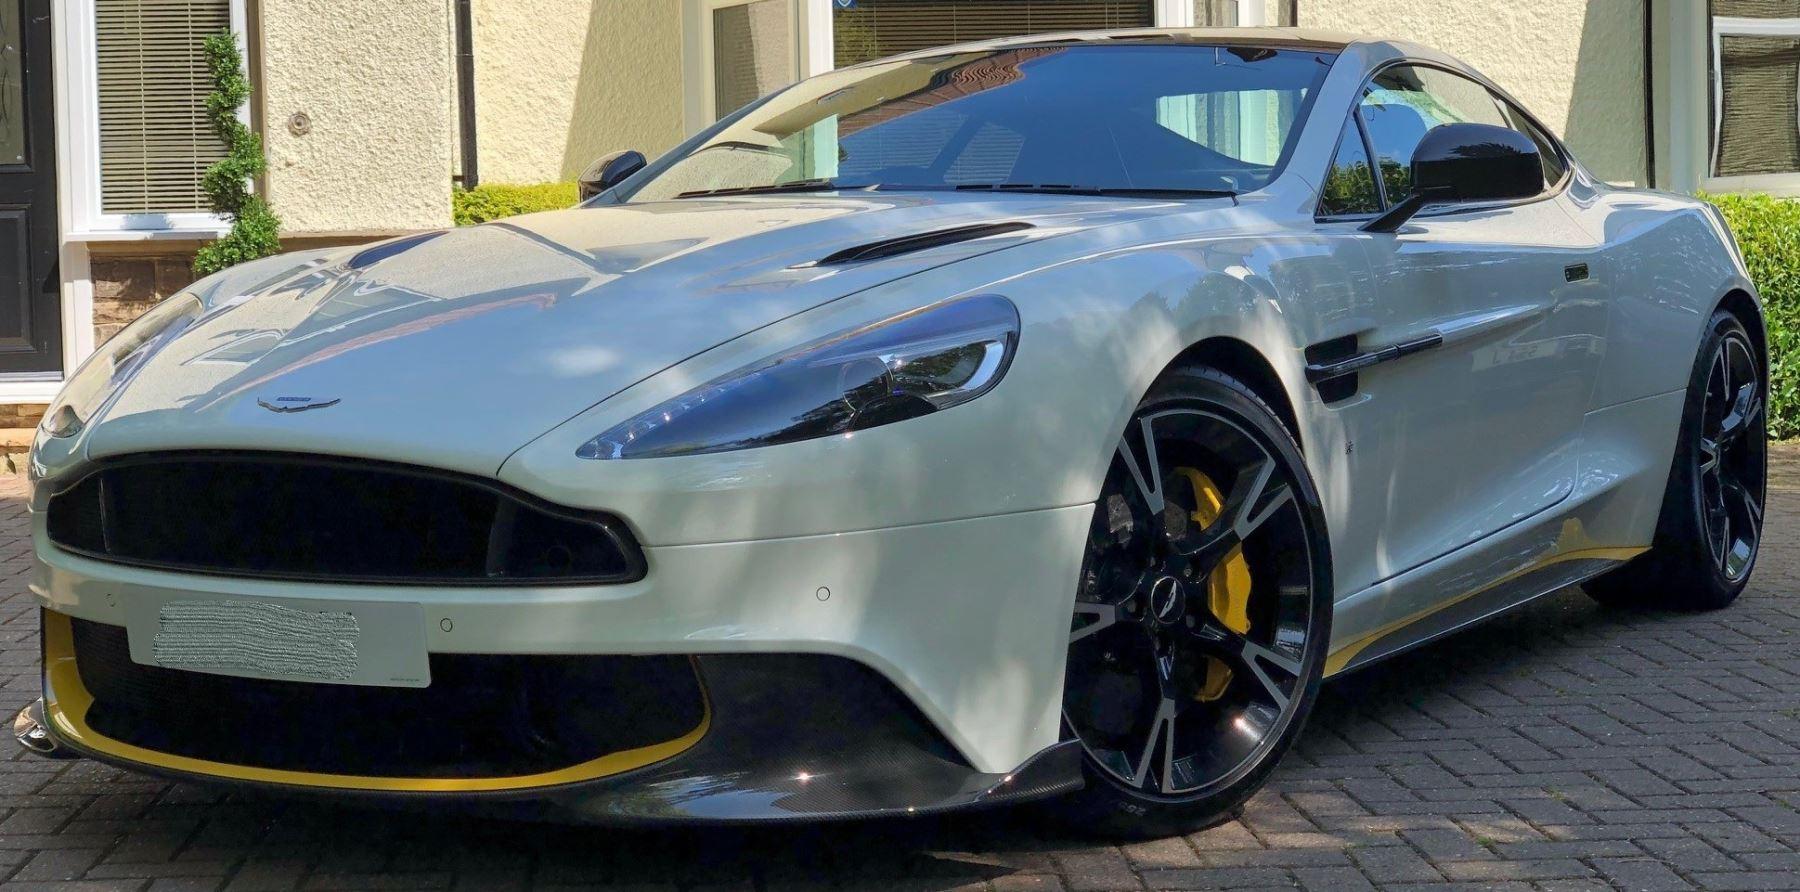 Aston Martin Vanquish S V12 [595] S 2+2 2dr Touchtronic Auto 5.9 Automatic Coupe (2018)